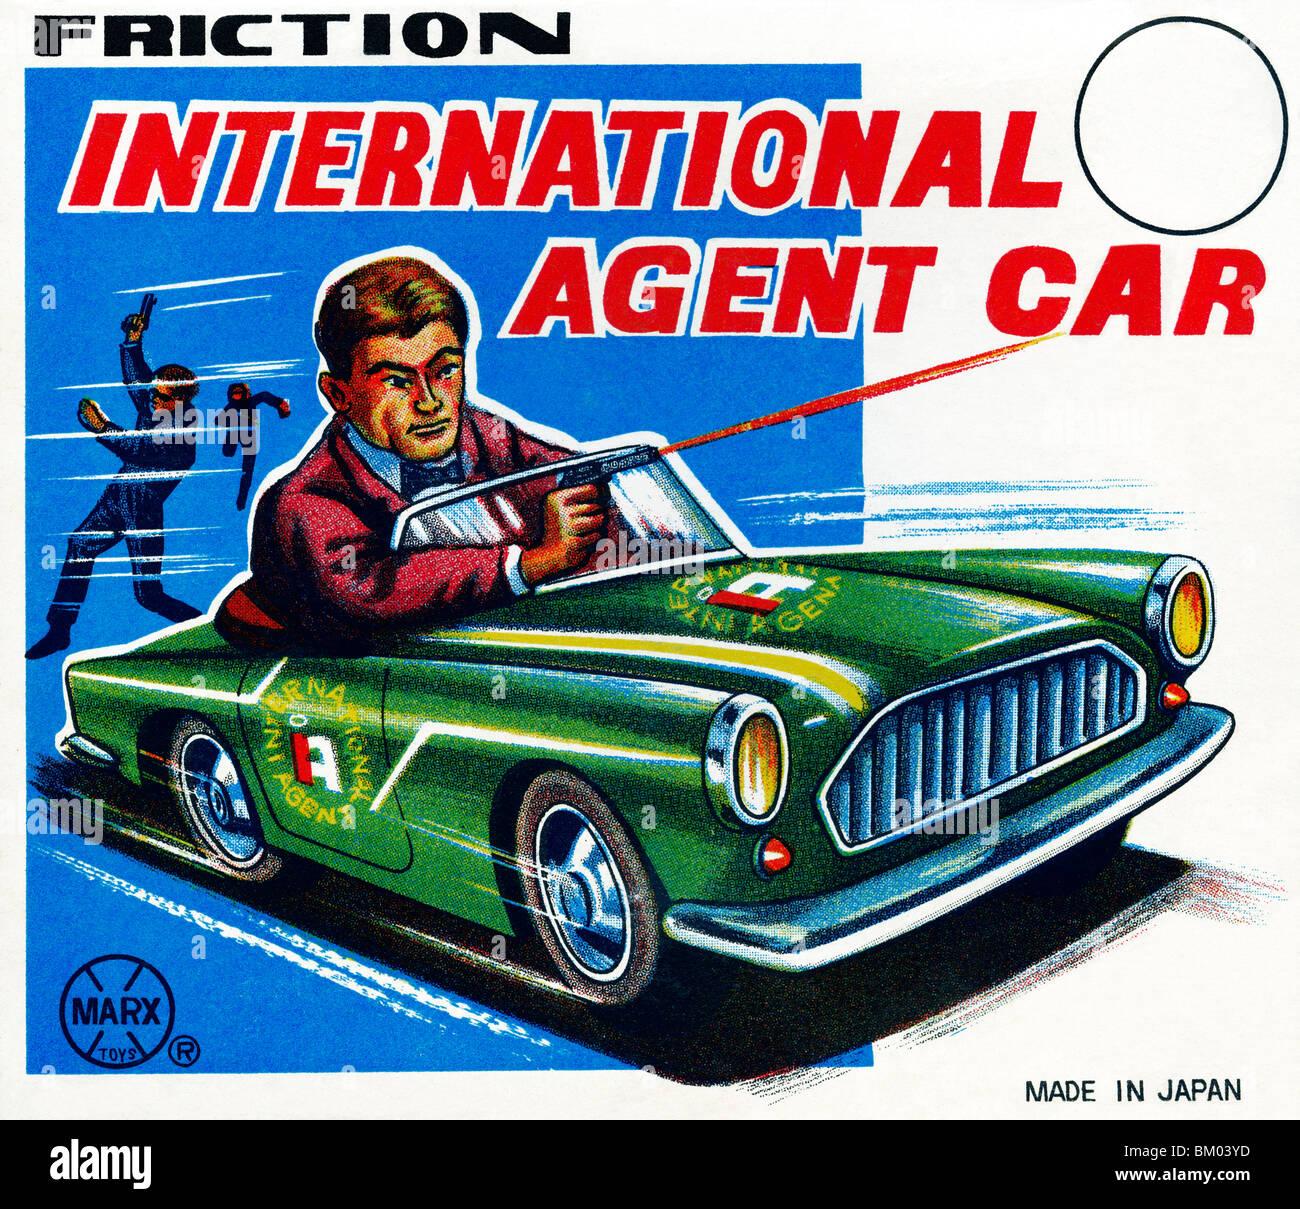 International Agent Car - Stock Image